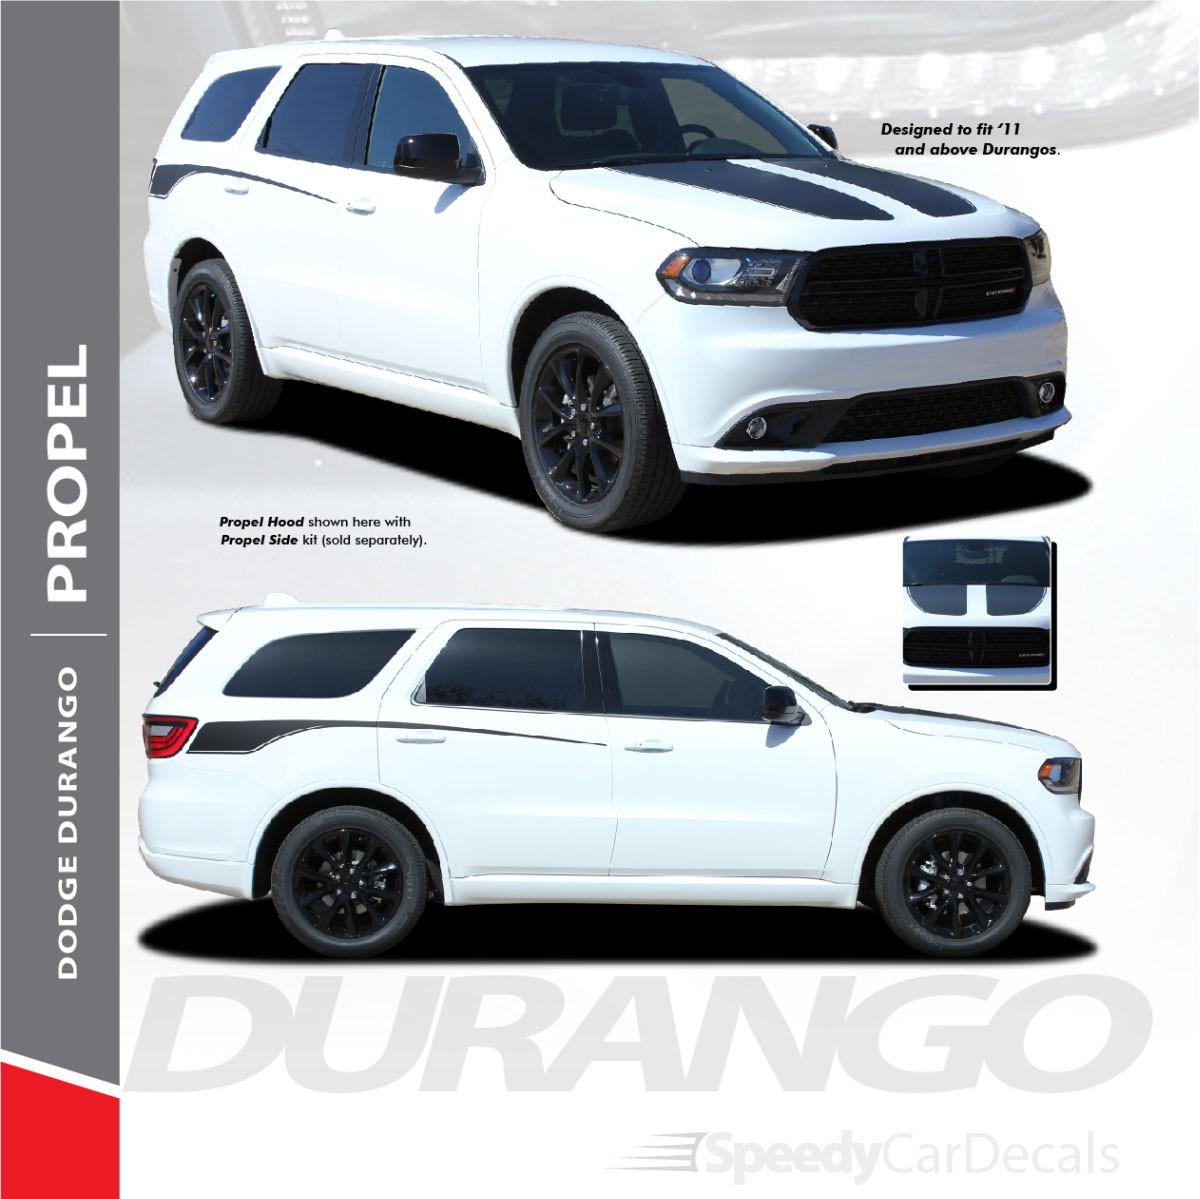 2011-2020 Dodge Durango PROPEL Hood & Side Stripes